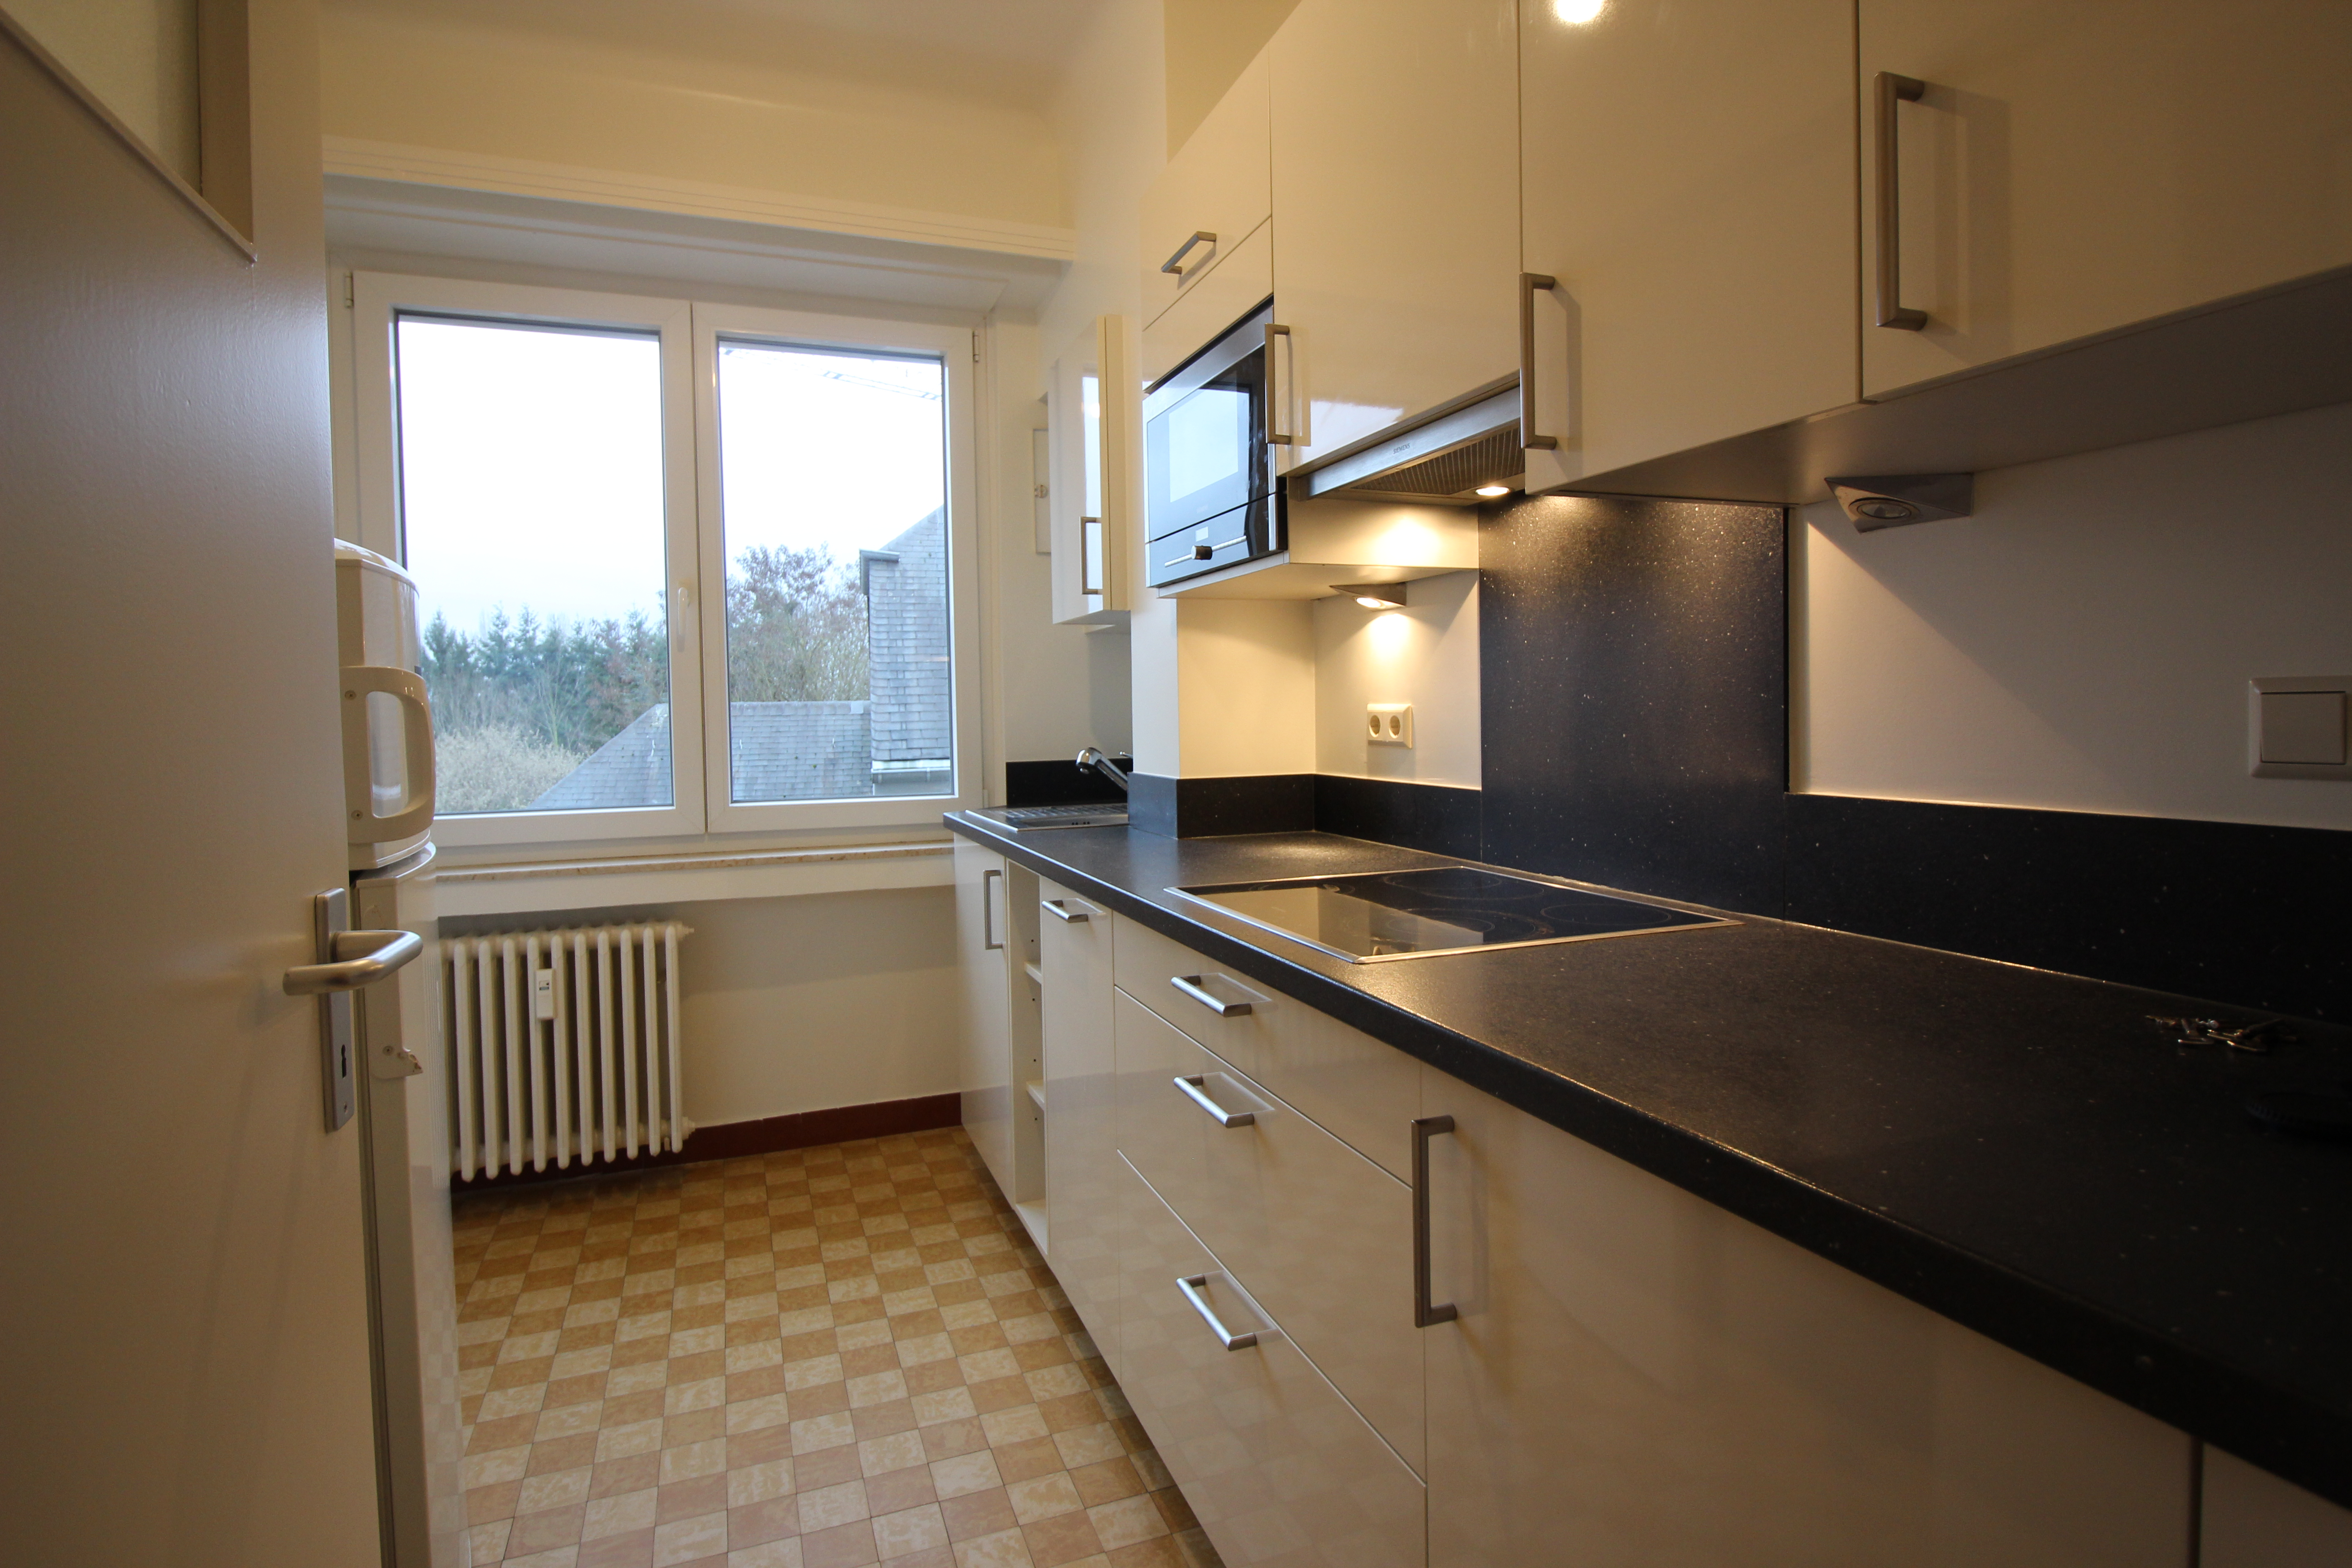 chambre en bazar awesome dcoratif temperature chambre. Black Bedroom Furniture Sets. Home Design Ideas